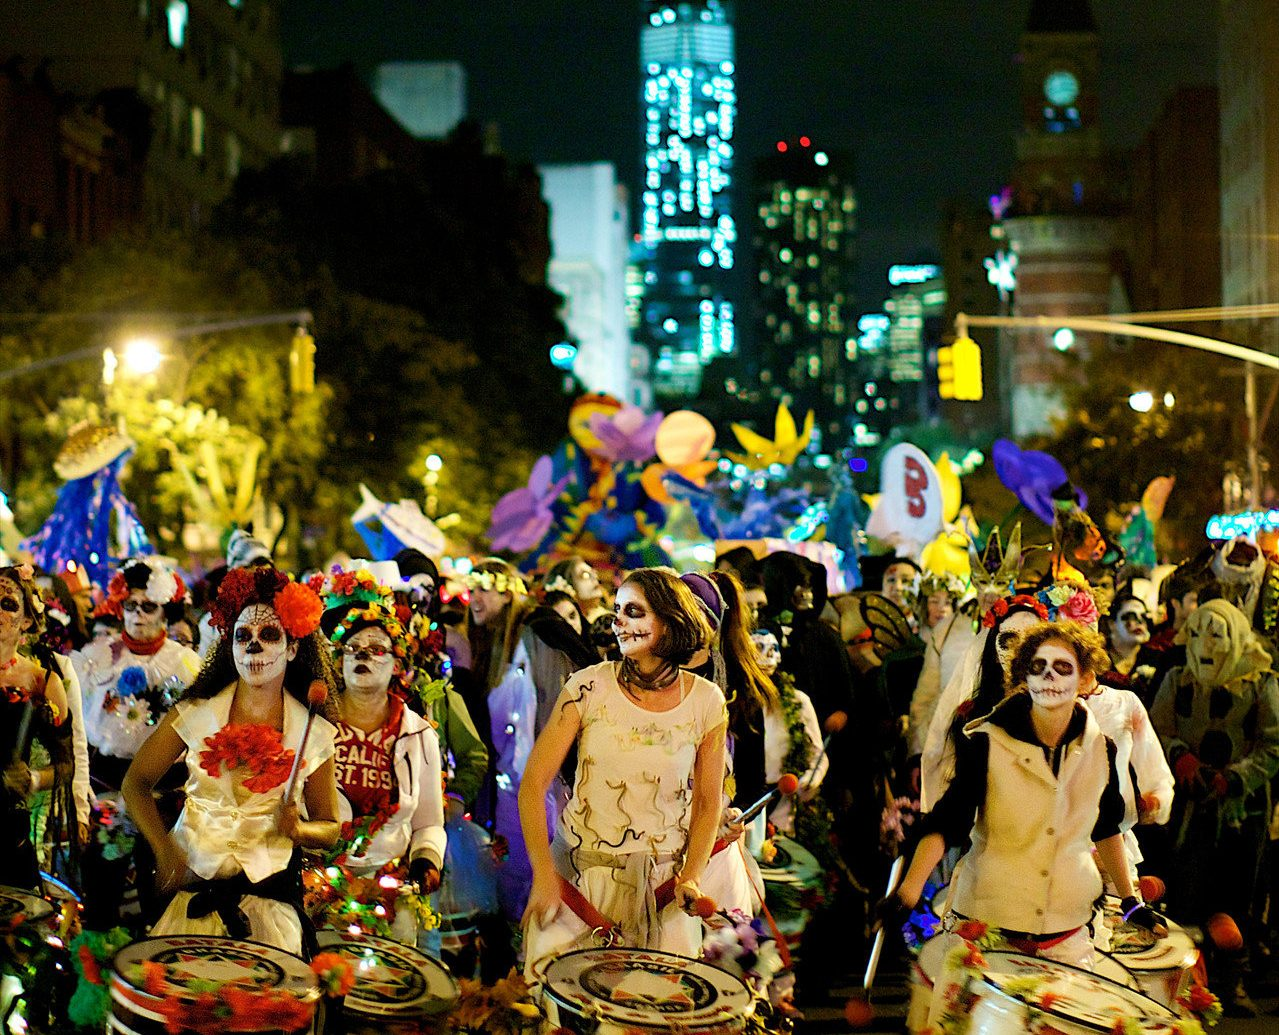 art Budget celebration costume crowd Entertainment festival festive fun Music musicians night Nightlife parade Party people street festival street musician streets street decorated